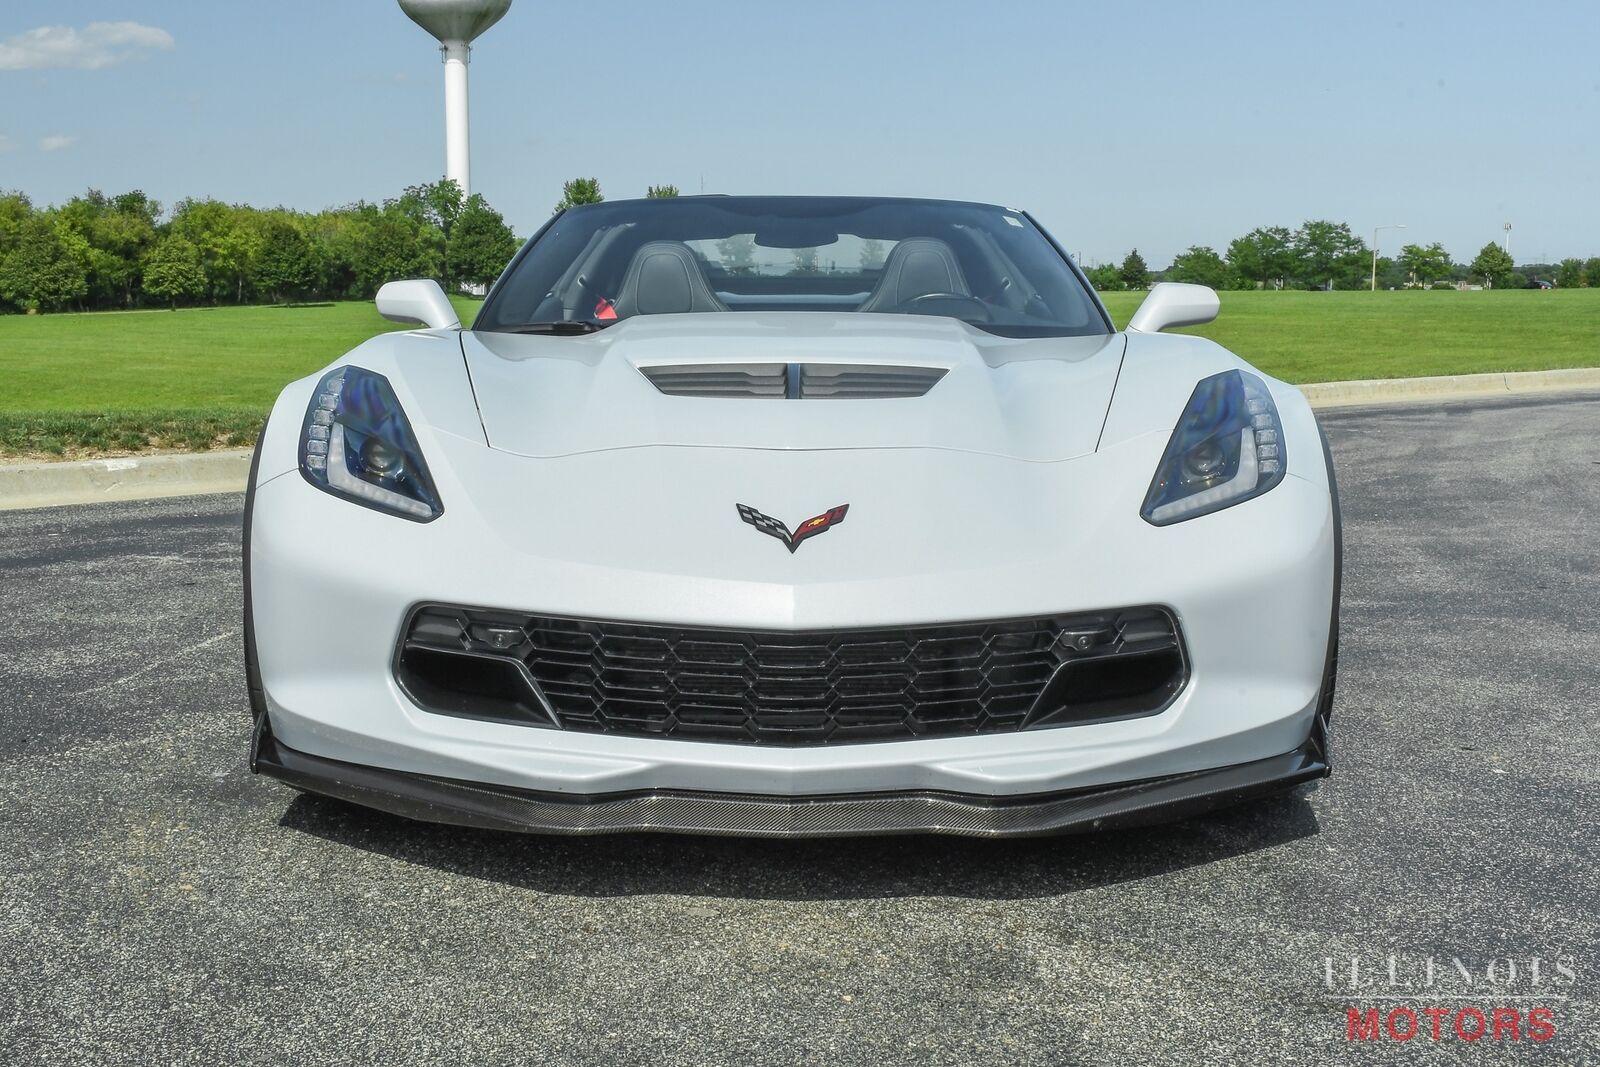 2019 Gray Chevrolet Corvette Z06  | C7 Corvette Photo 9